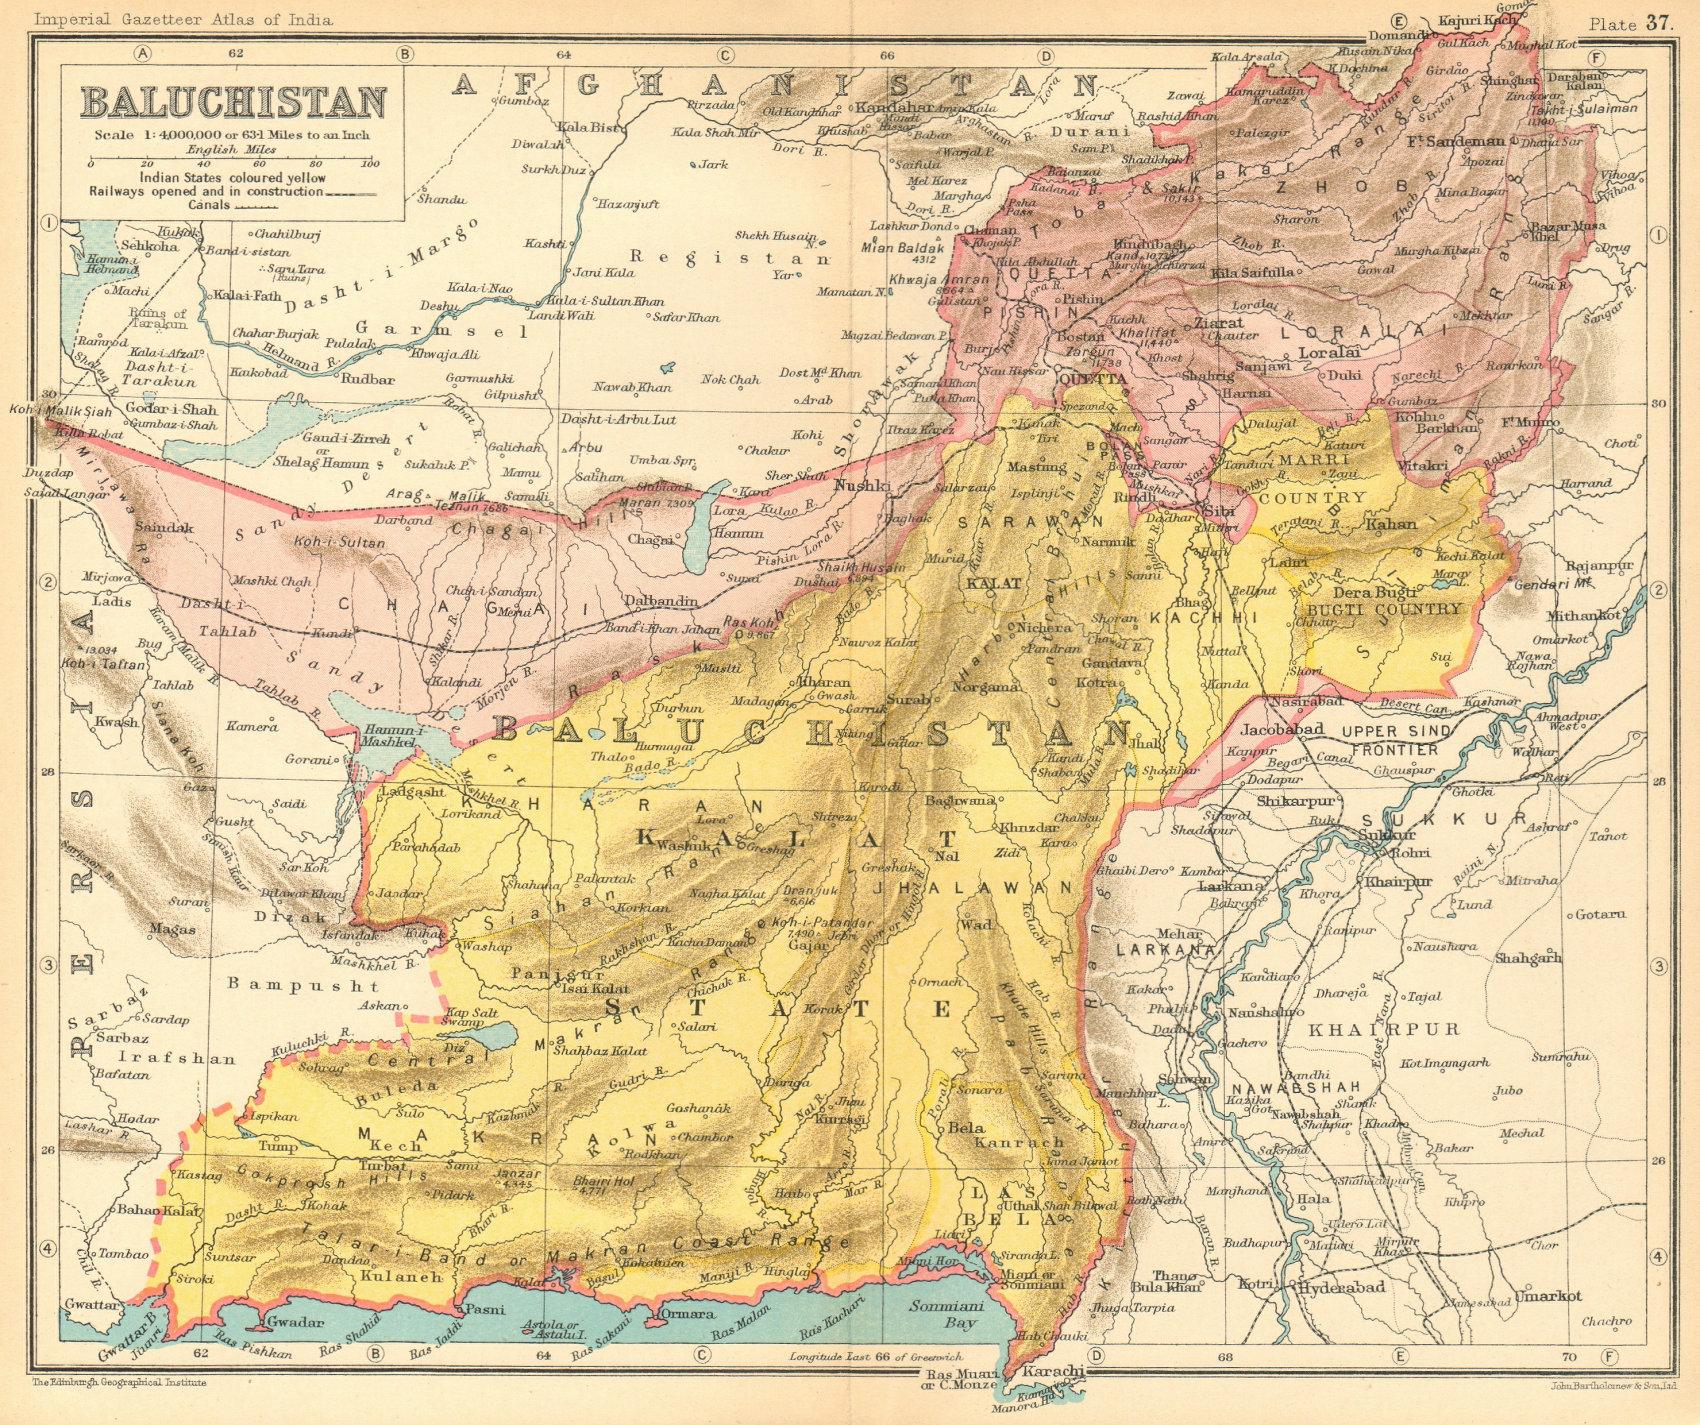 Associate Product 'Baluchistan'. British India/Pakistan province. Balochistan 1931 old map